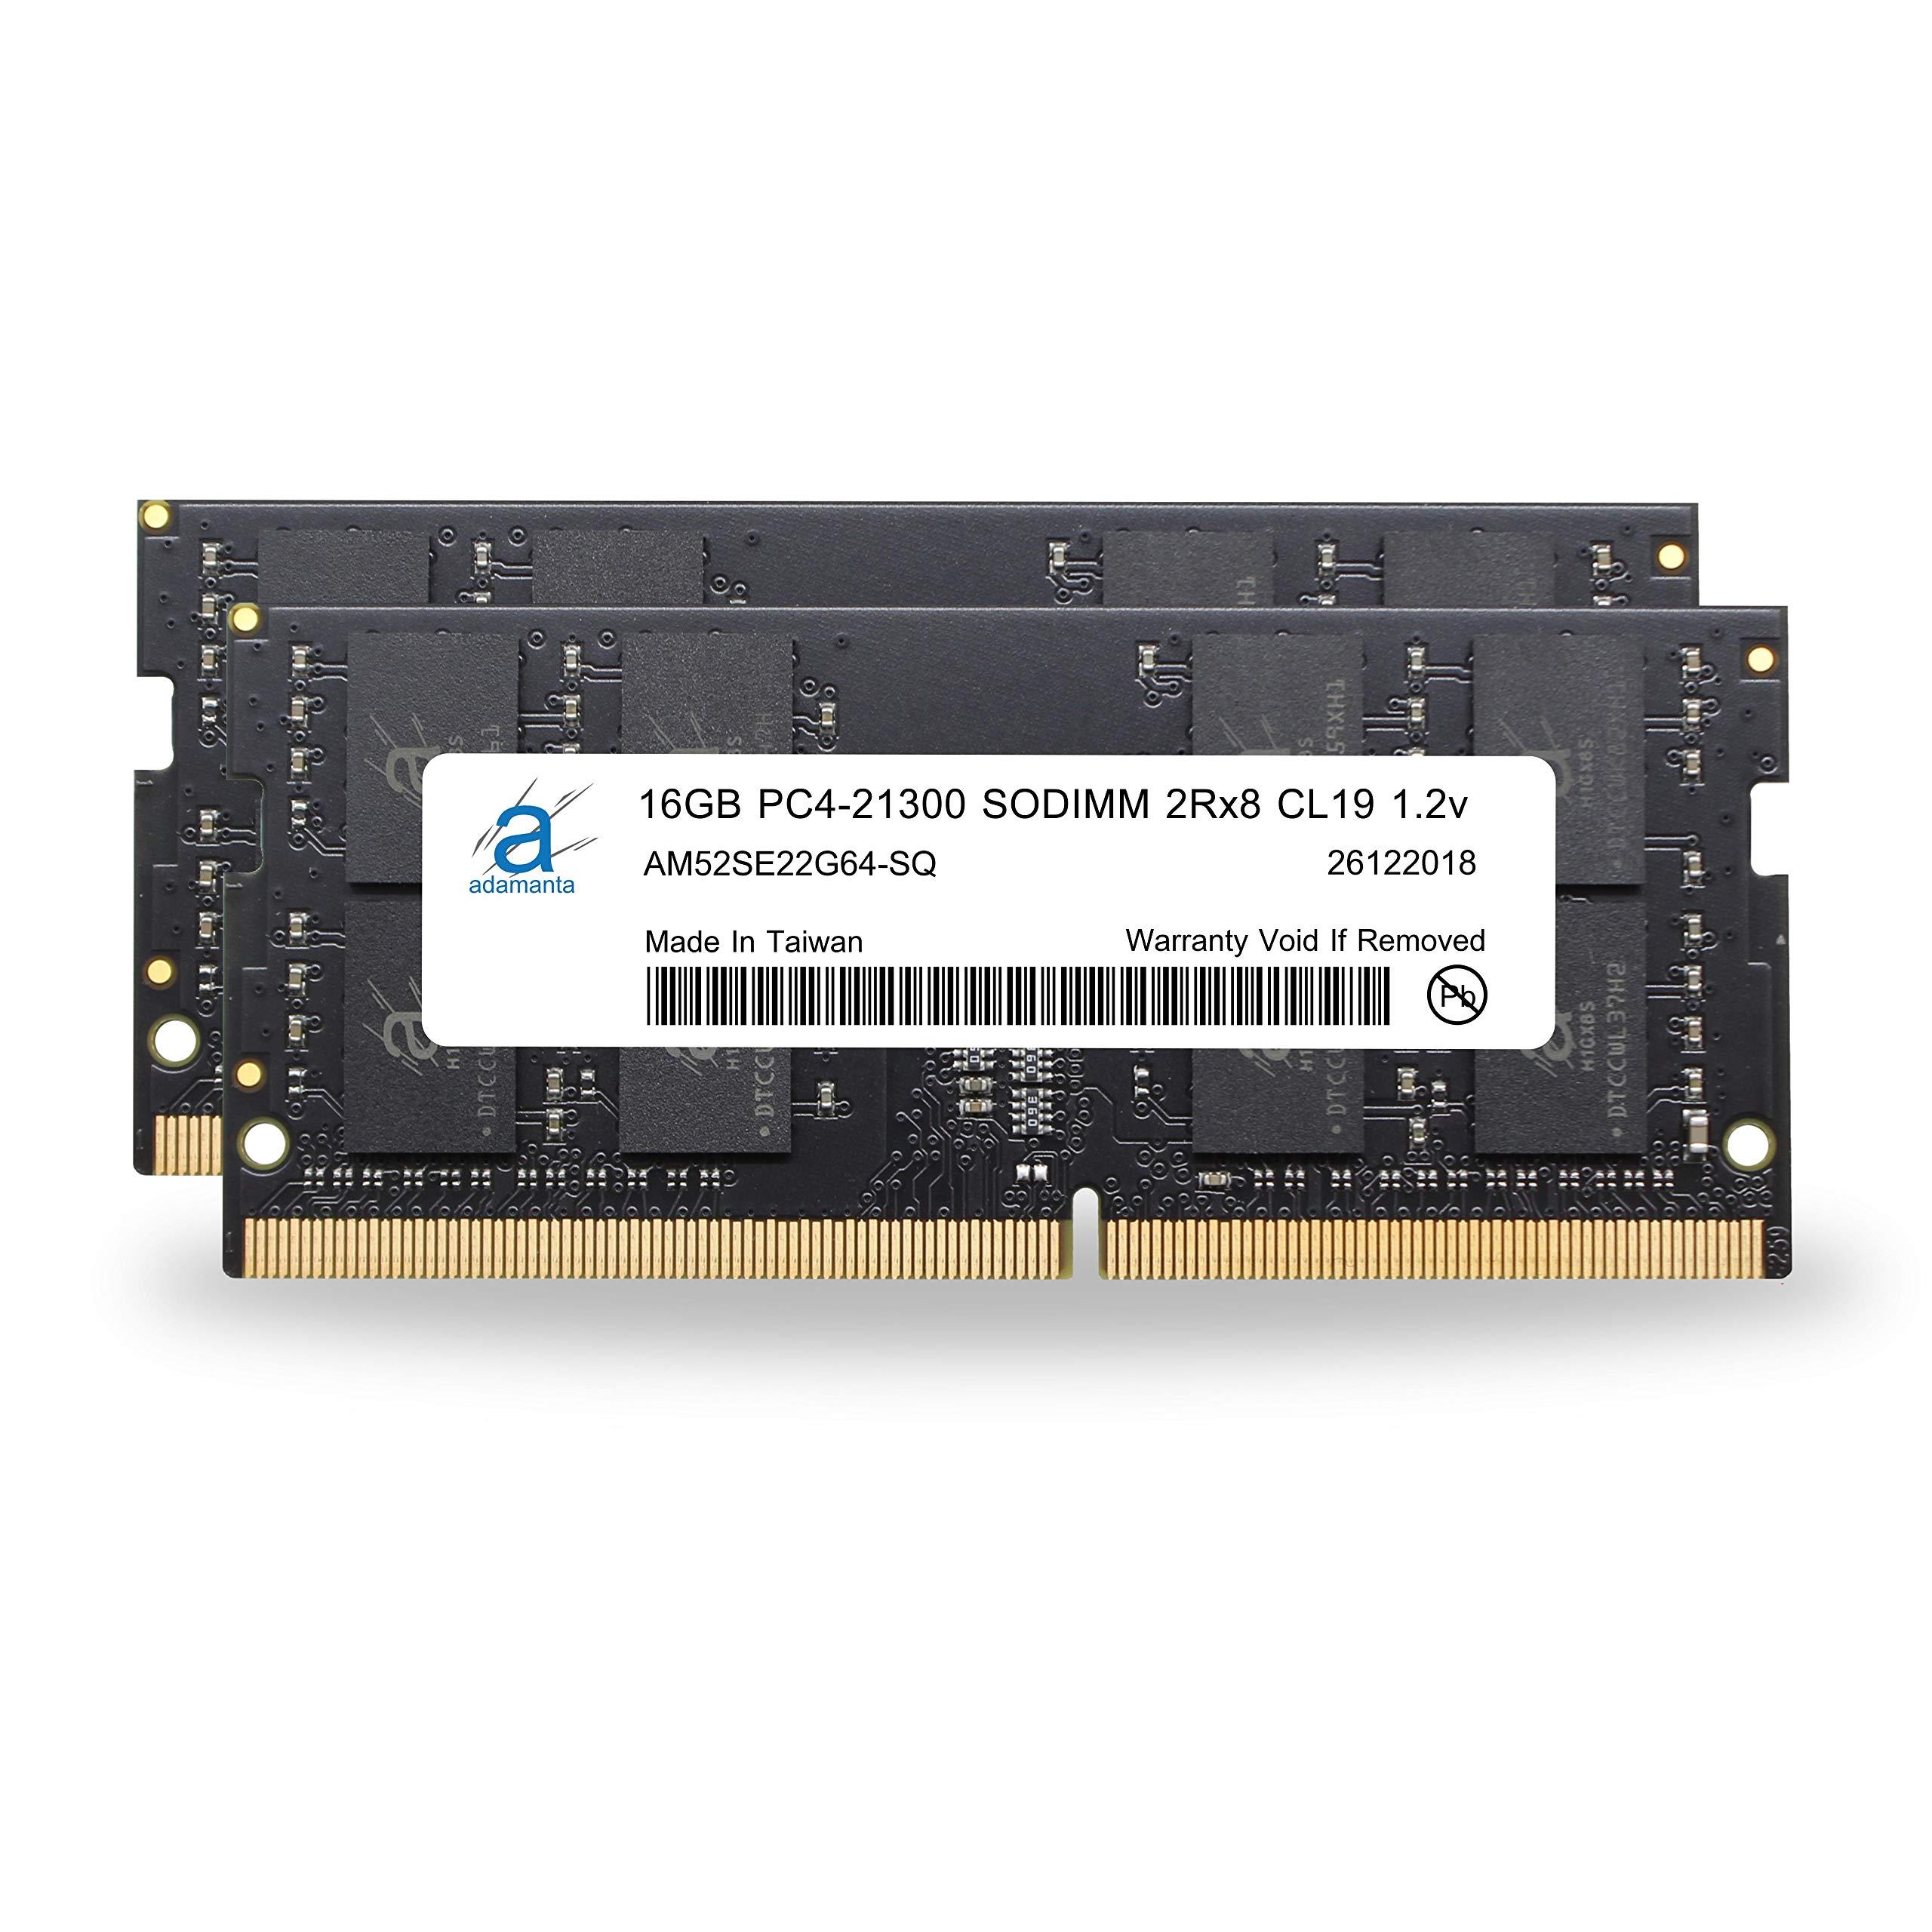 Adamanta 32GB (2x16GB) Memory Upgrade for 2019 Apple iMac 27'' w/Retina 5K Display, Late 2018 Apple Mac Mini DDR4 2666Mhz PC4-21300 SODIMM 2Rx8 CL19 1.2v DRAM RAM